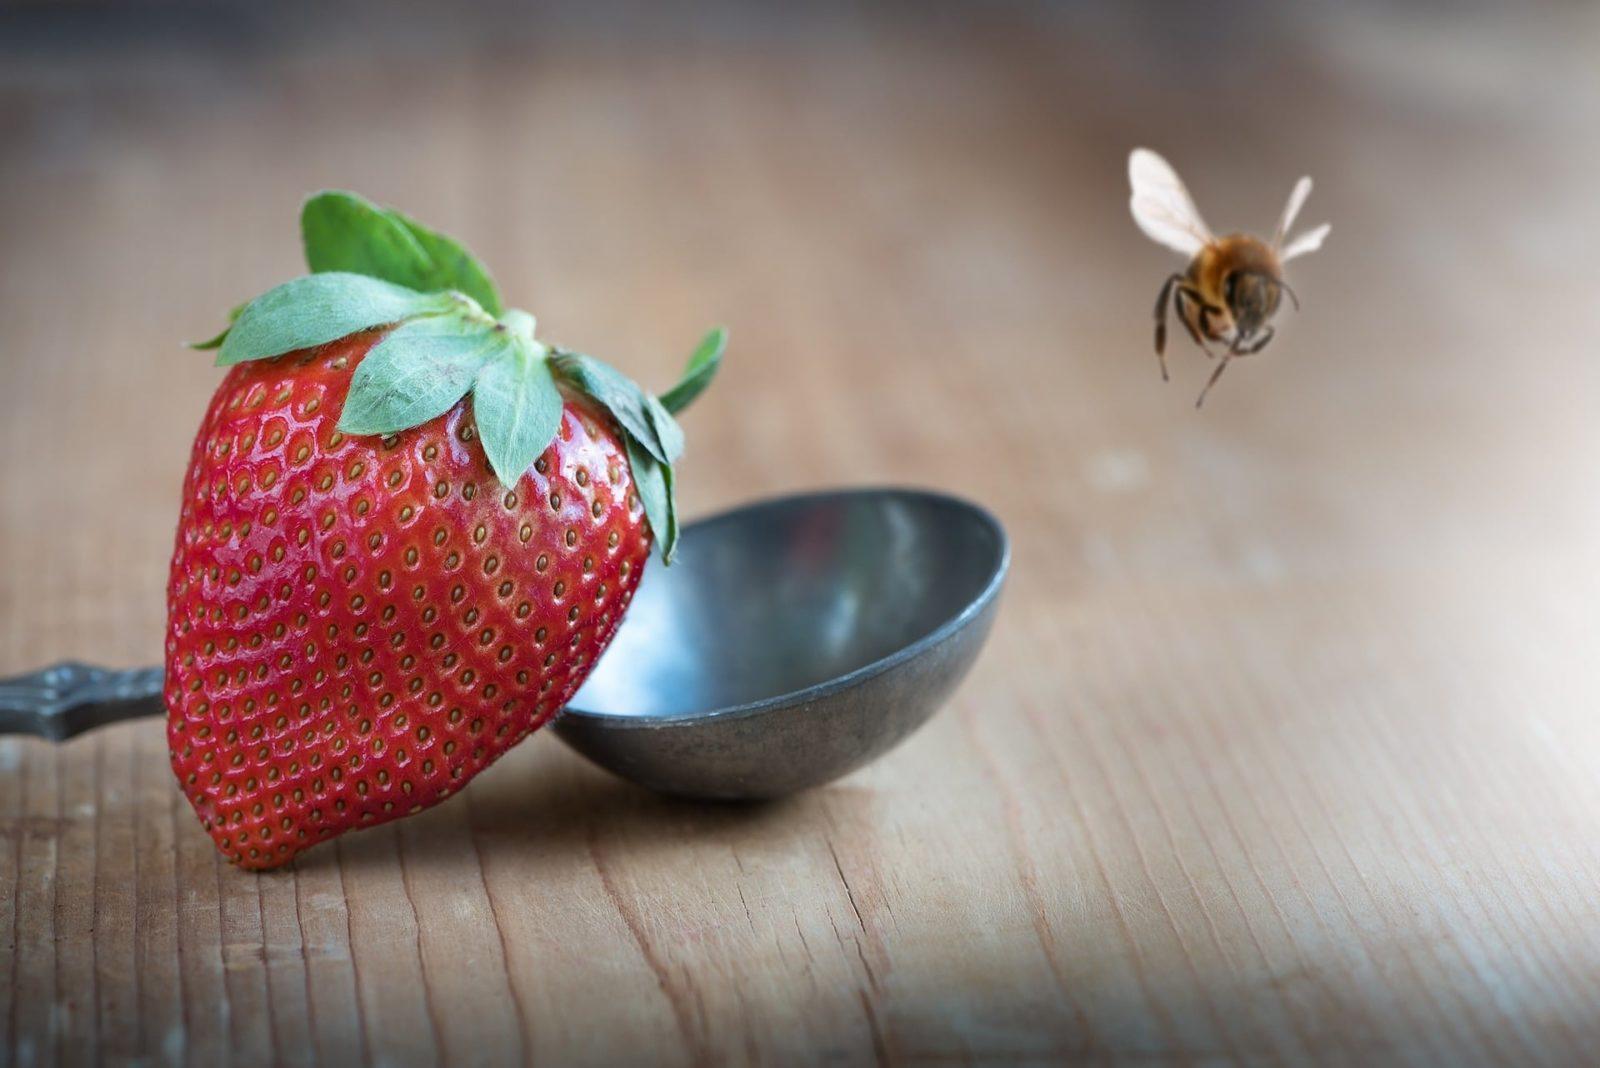 Bessere Beeren durch Bienen-Bestäubung